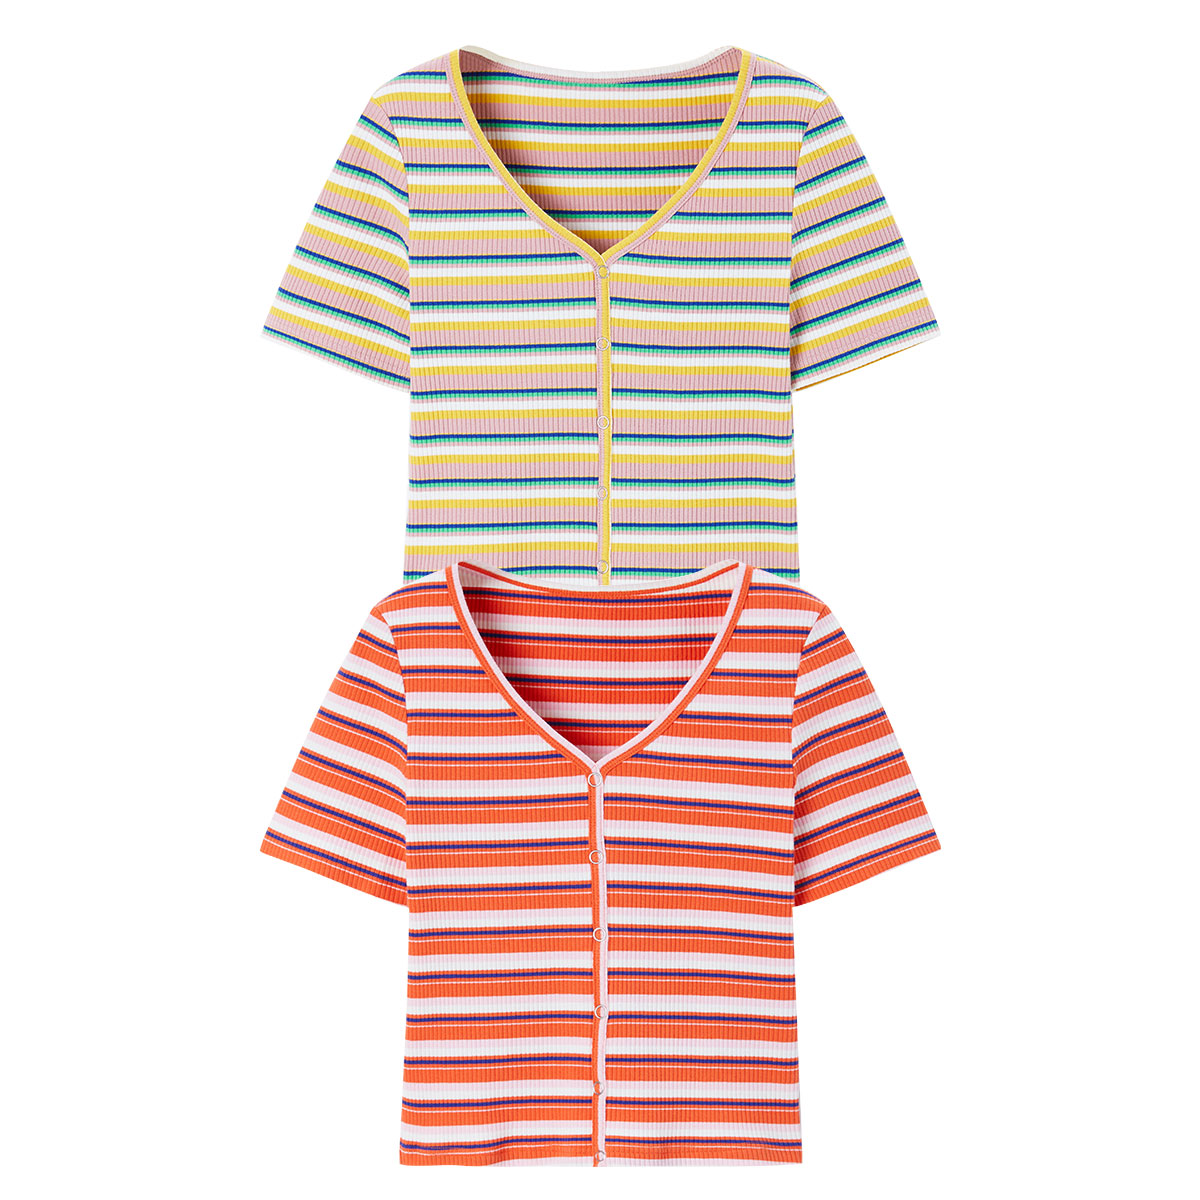 PEACEBIRD 太平鸟 泫雅风彩虹条纹短袖t恤修身短款针织打底衫女 M